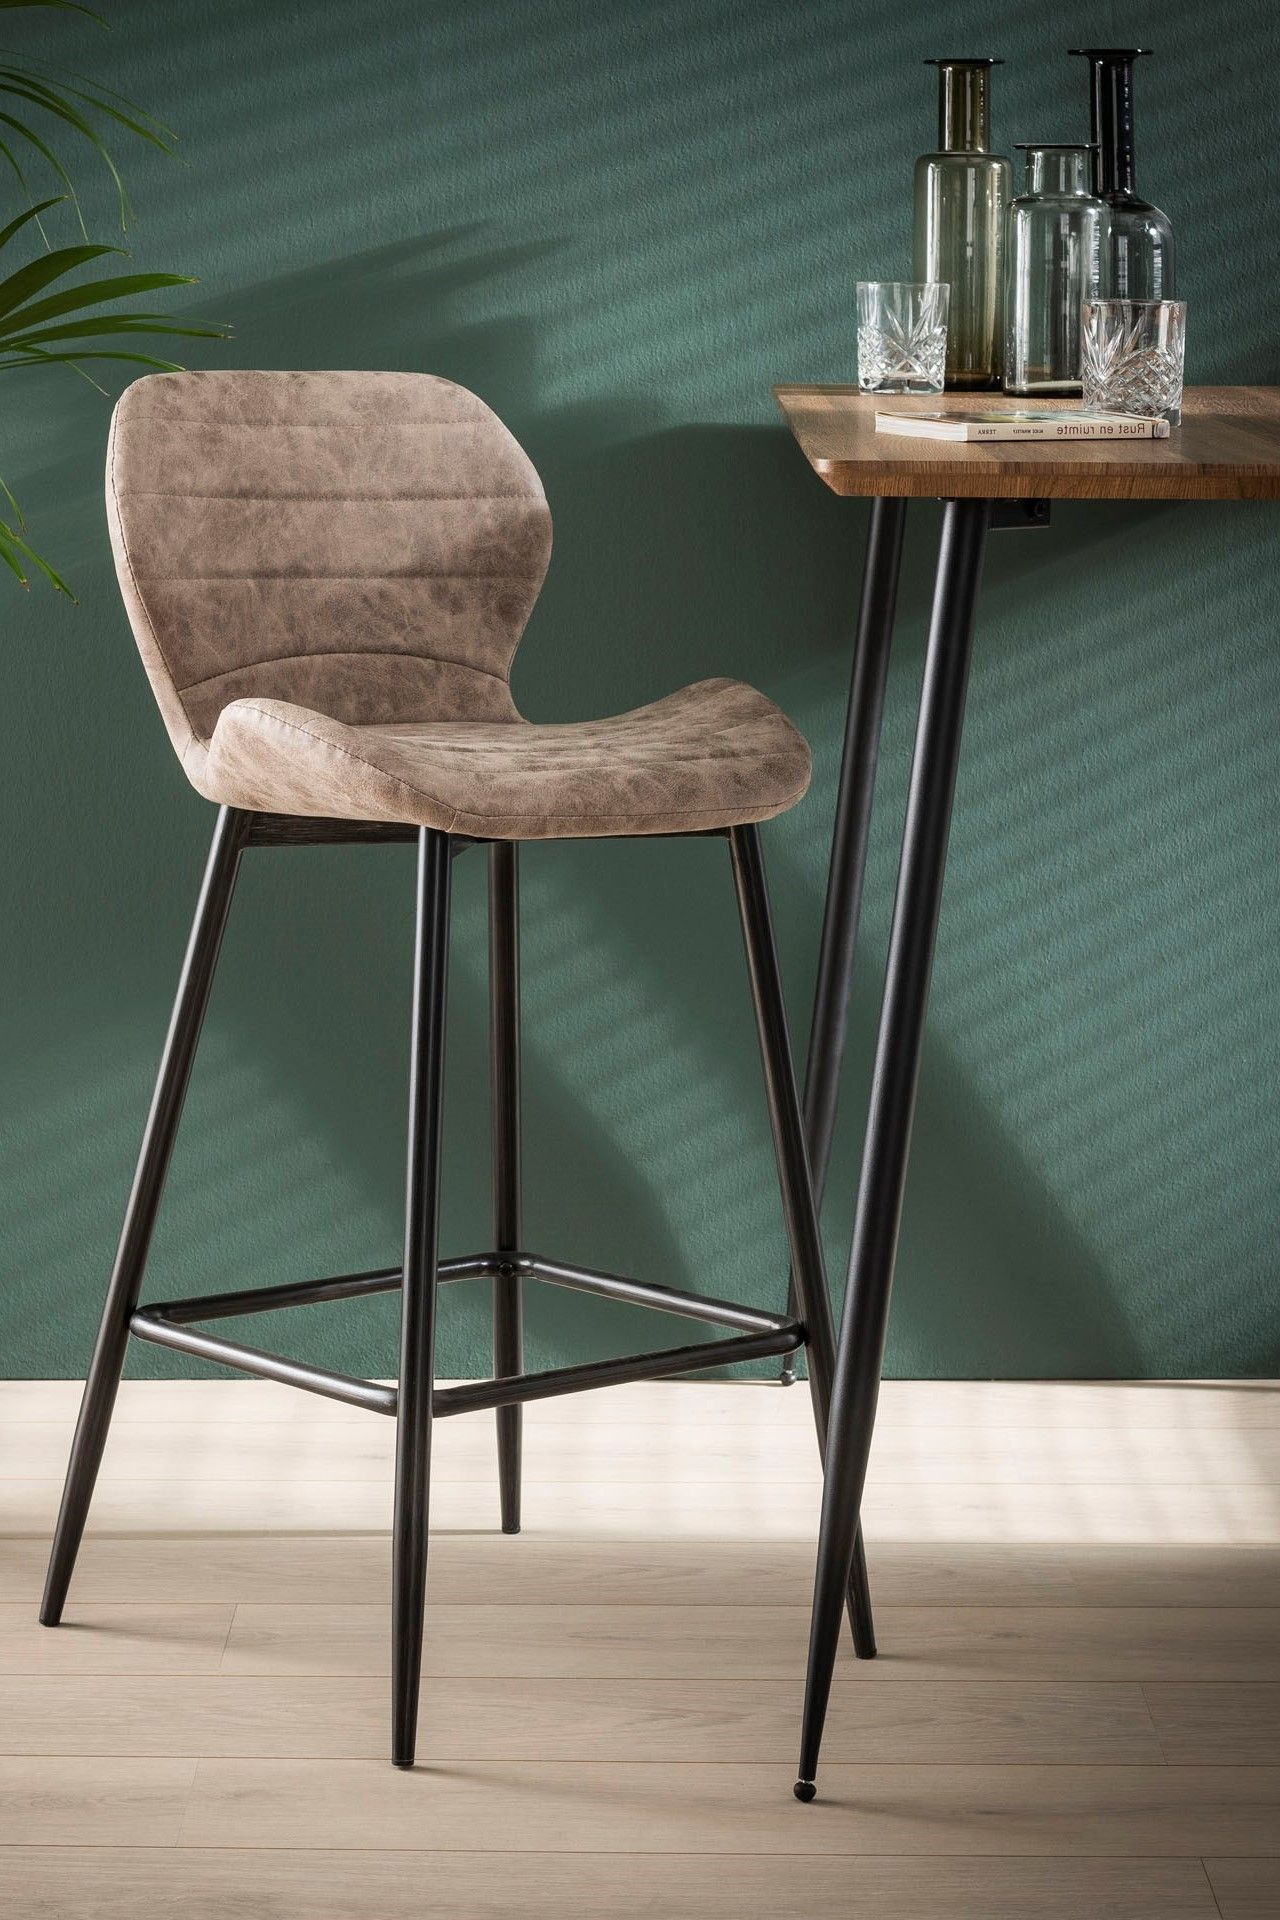 Chaise De Bar Marron Fonce Java En 2020 Chaise Bar Tabouret De Bar Chaise De Bar Design